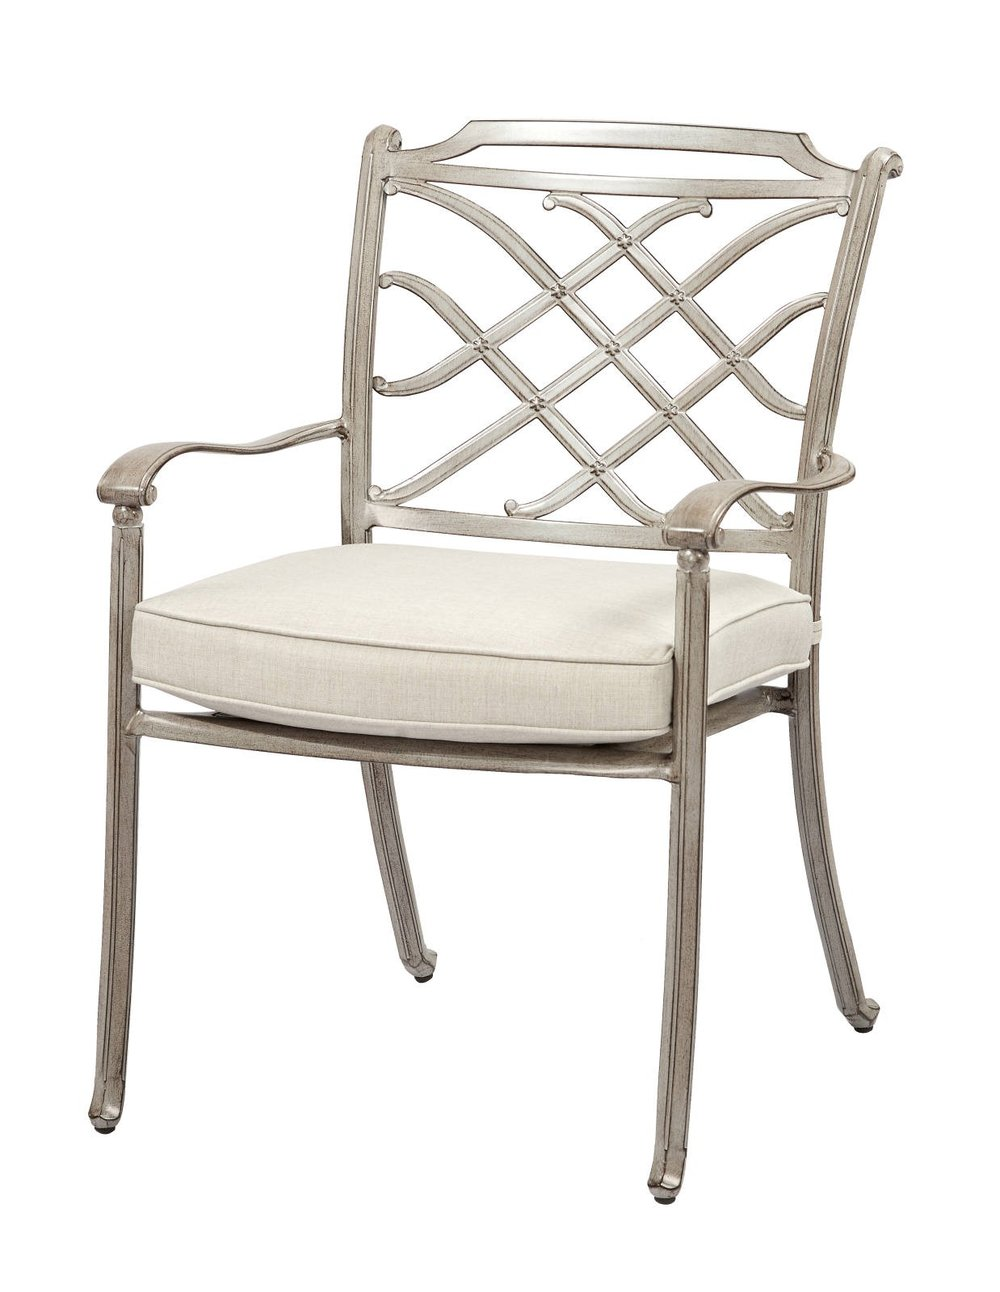 Sydney Cast Dining Chair with Cushion